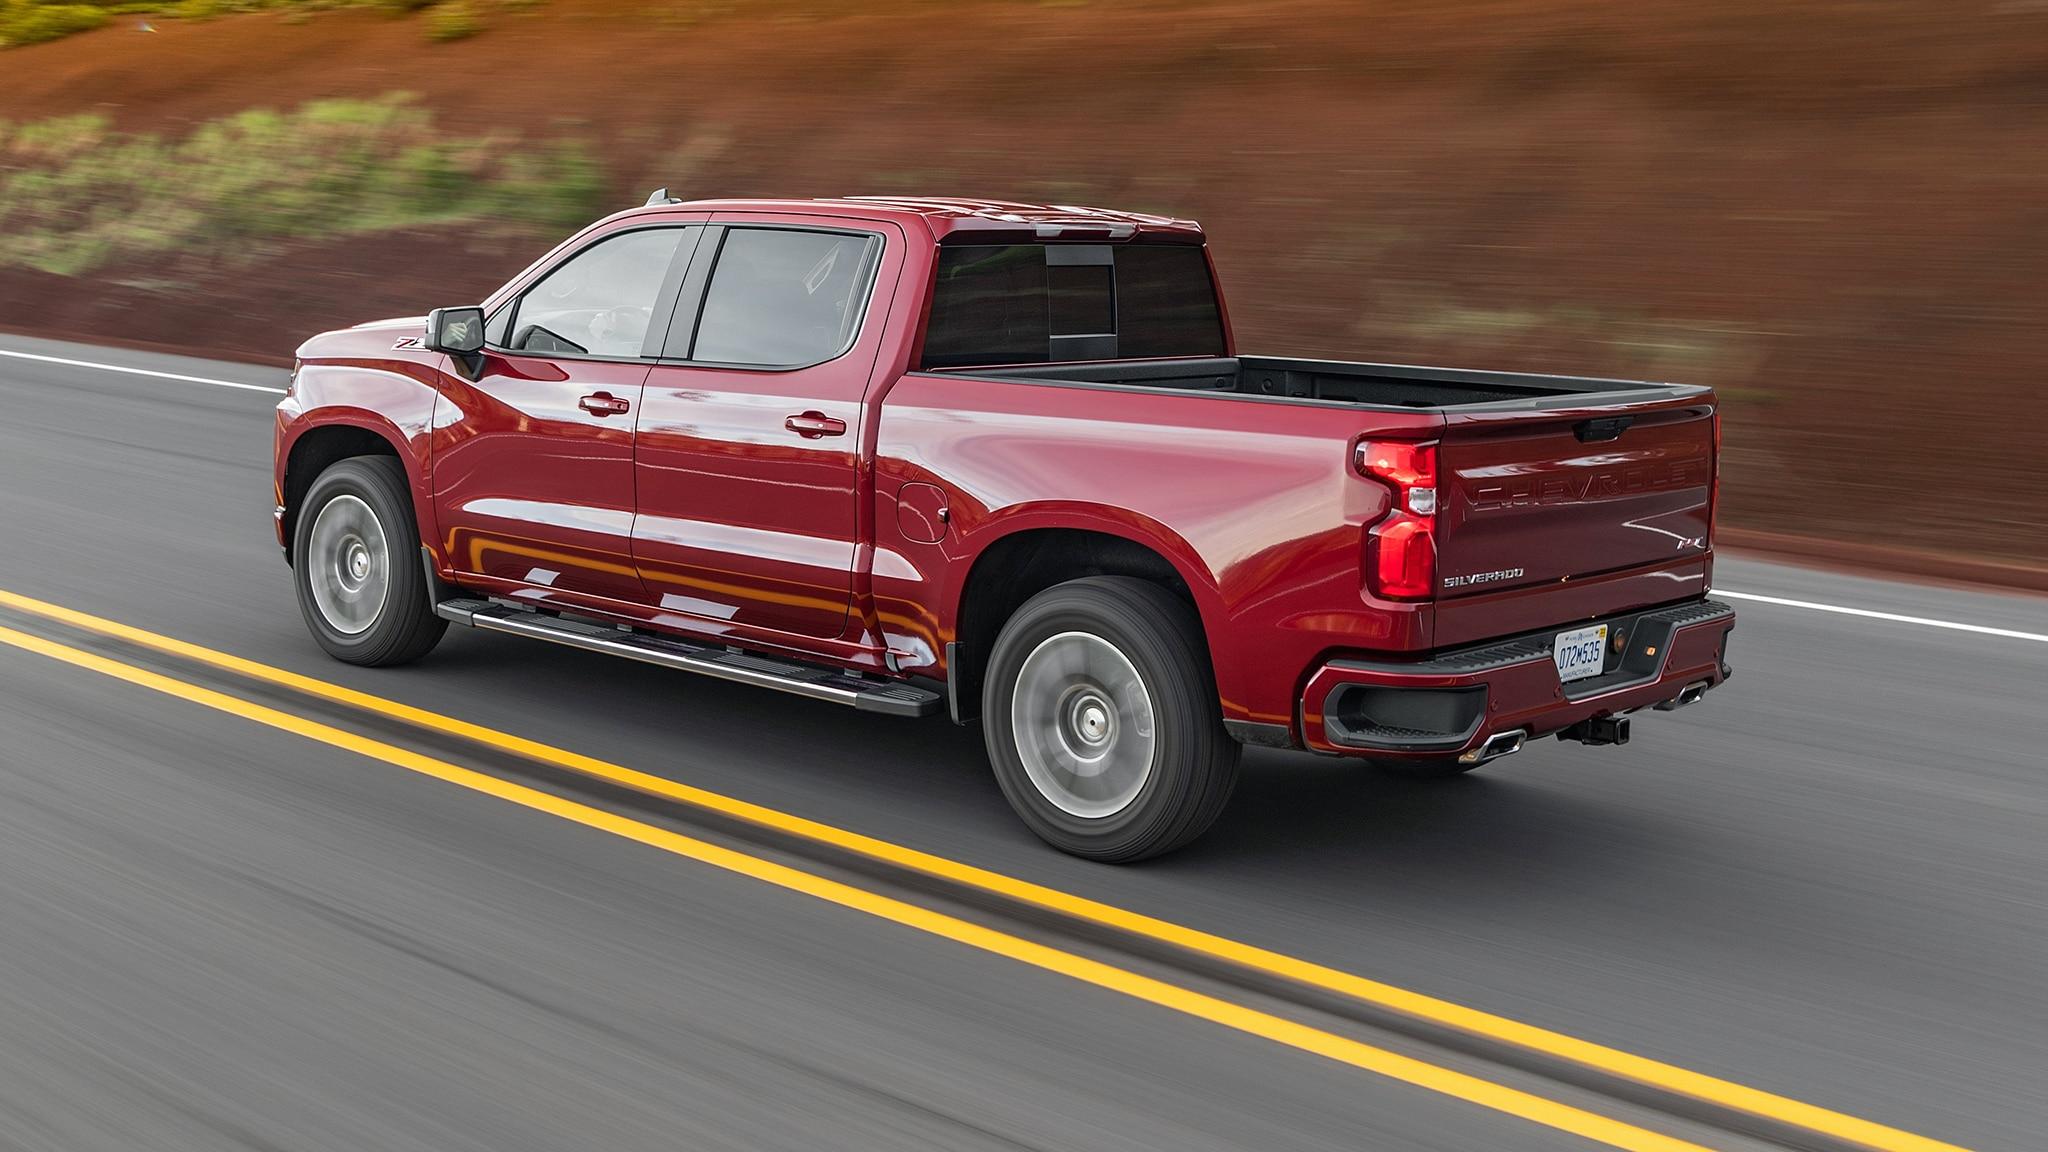 2020 Chevrolet Silverado 1500 Diesel First Drive Review | Automobile Magazine